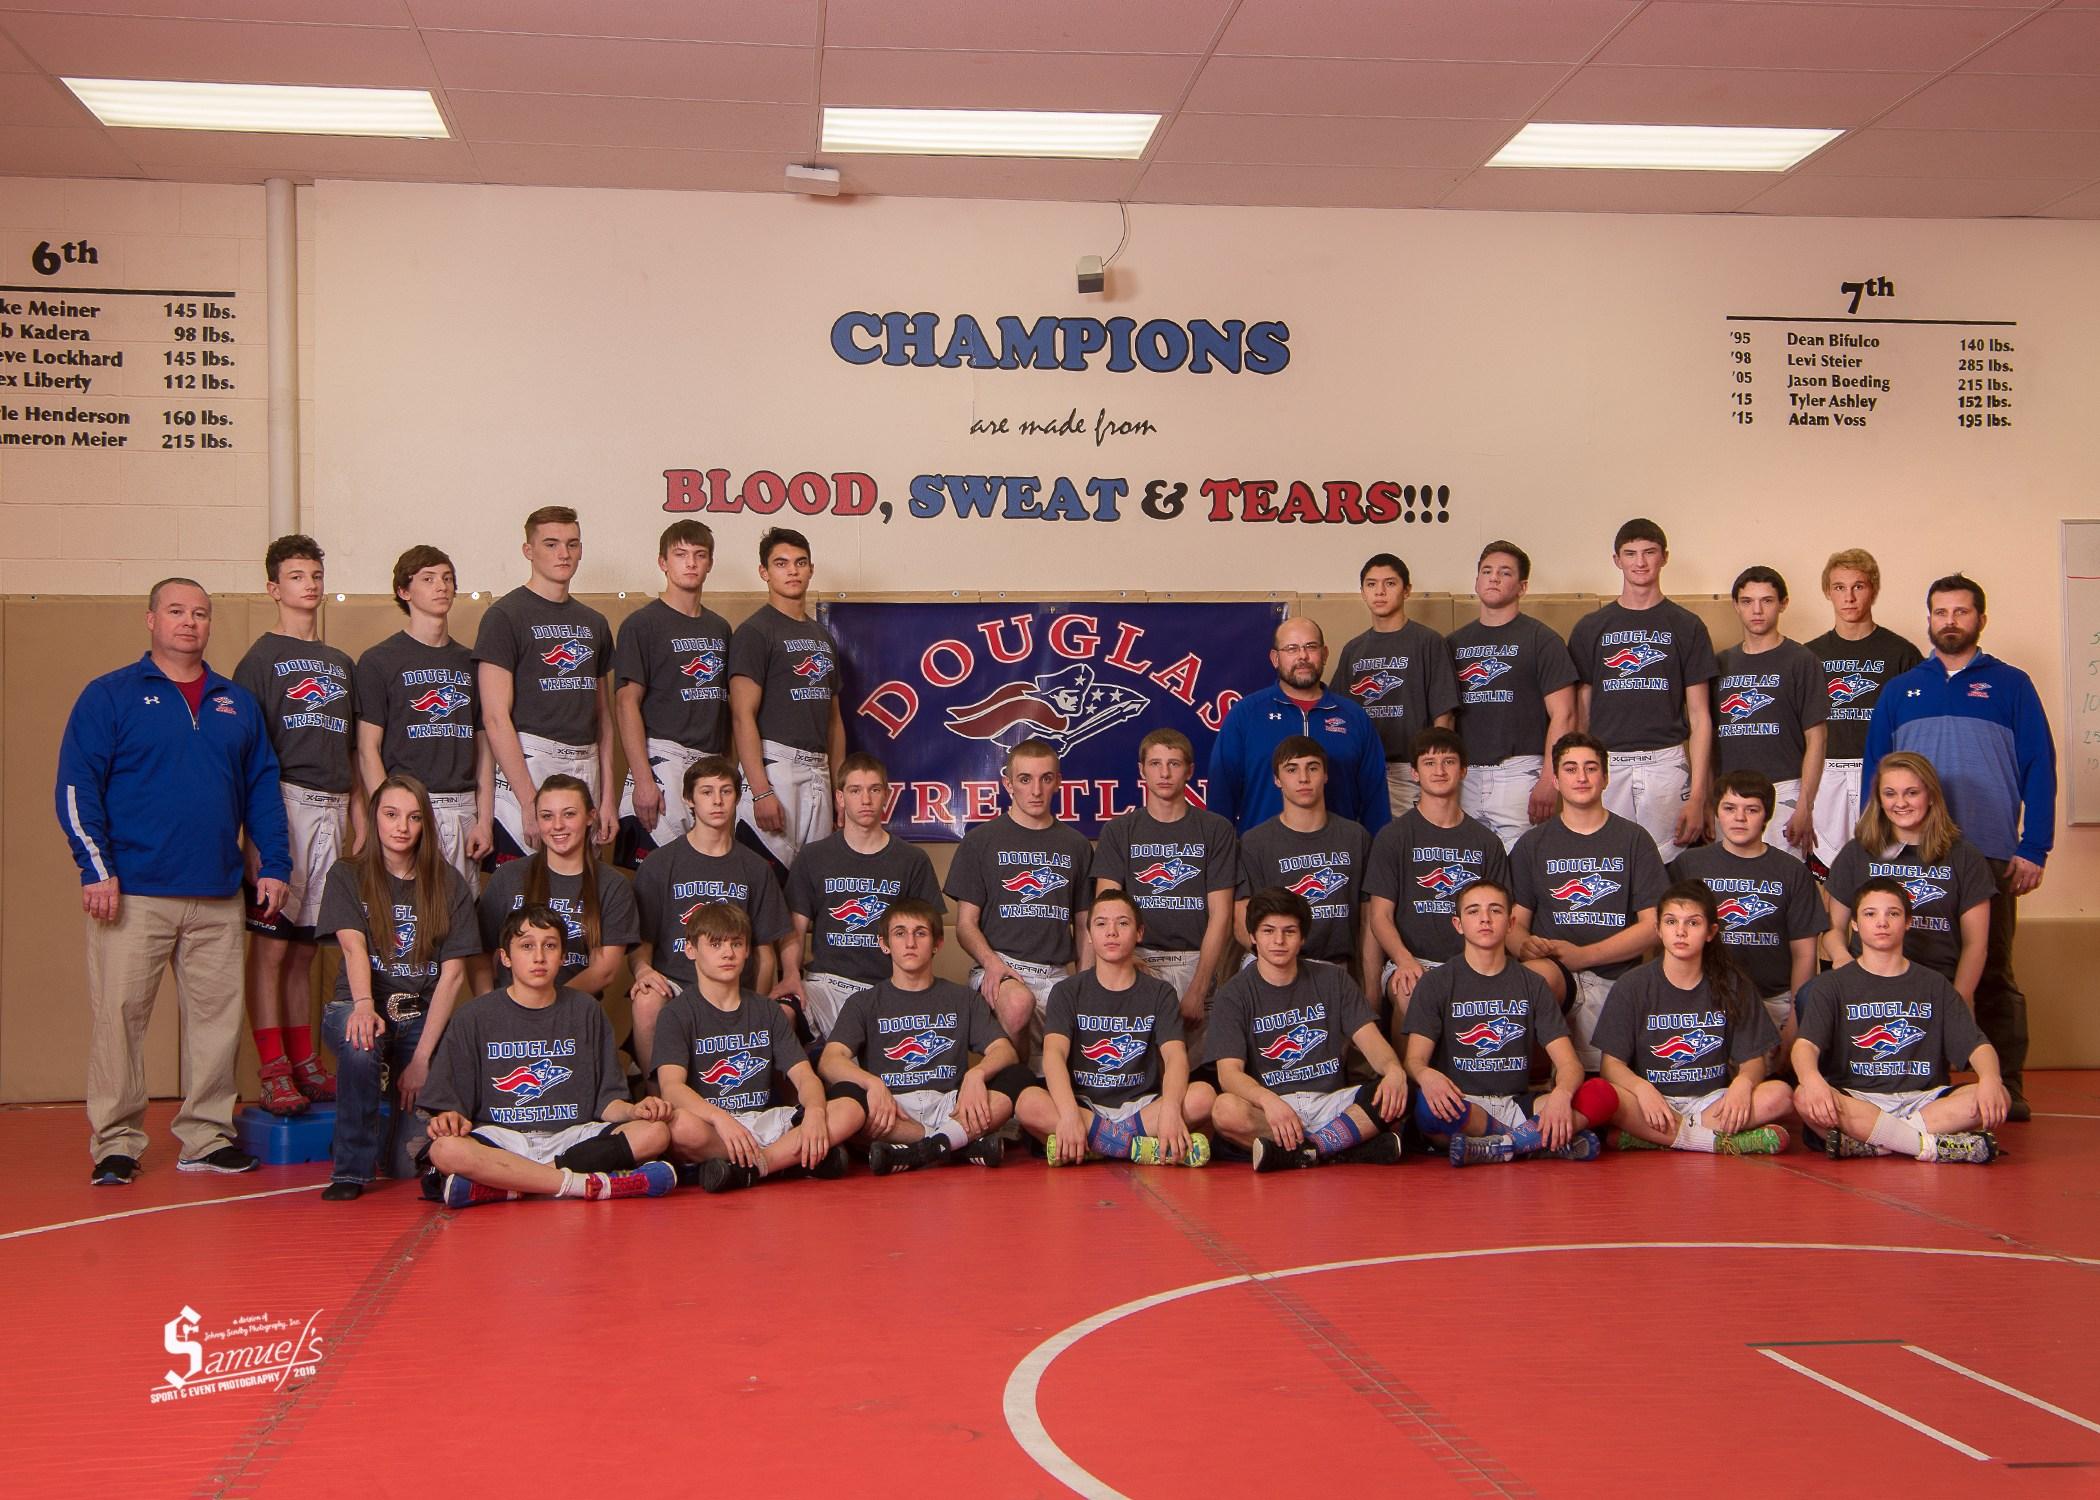 dhs activities douglas high school douglas school district patriot wrestling